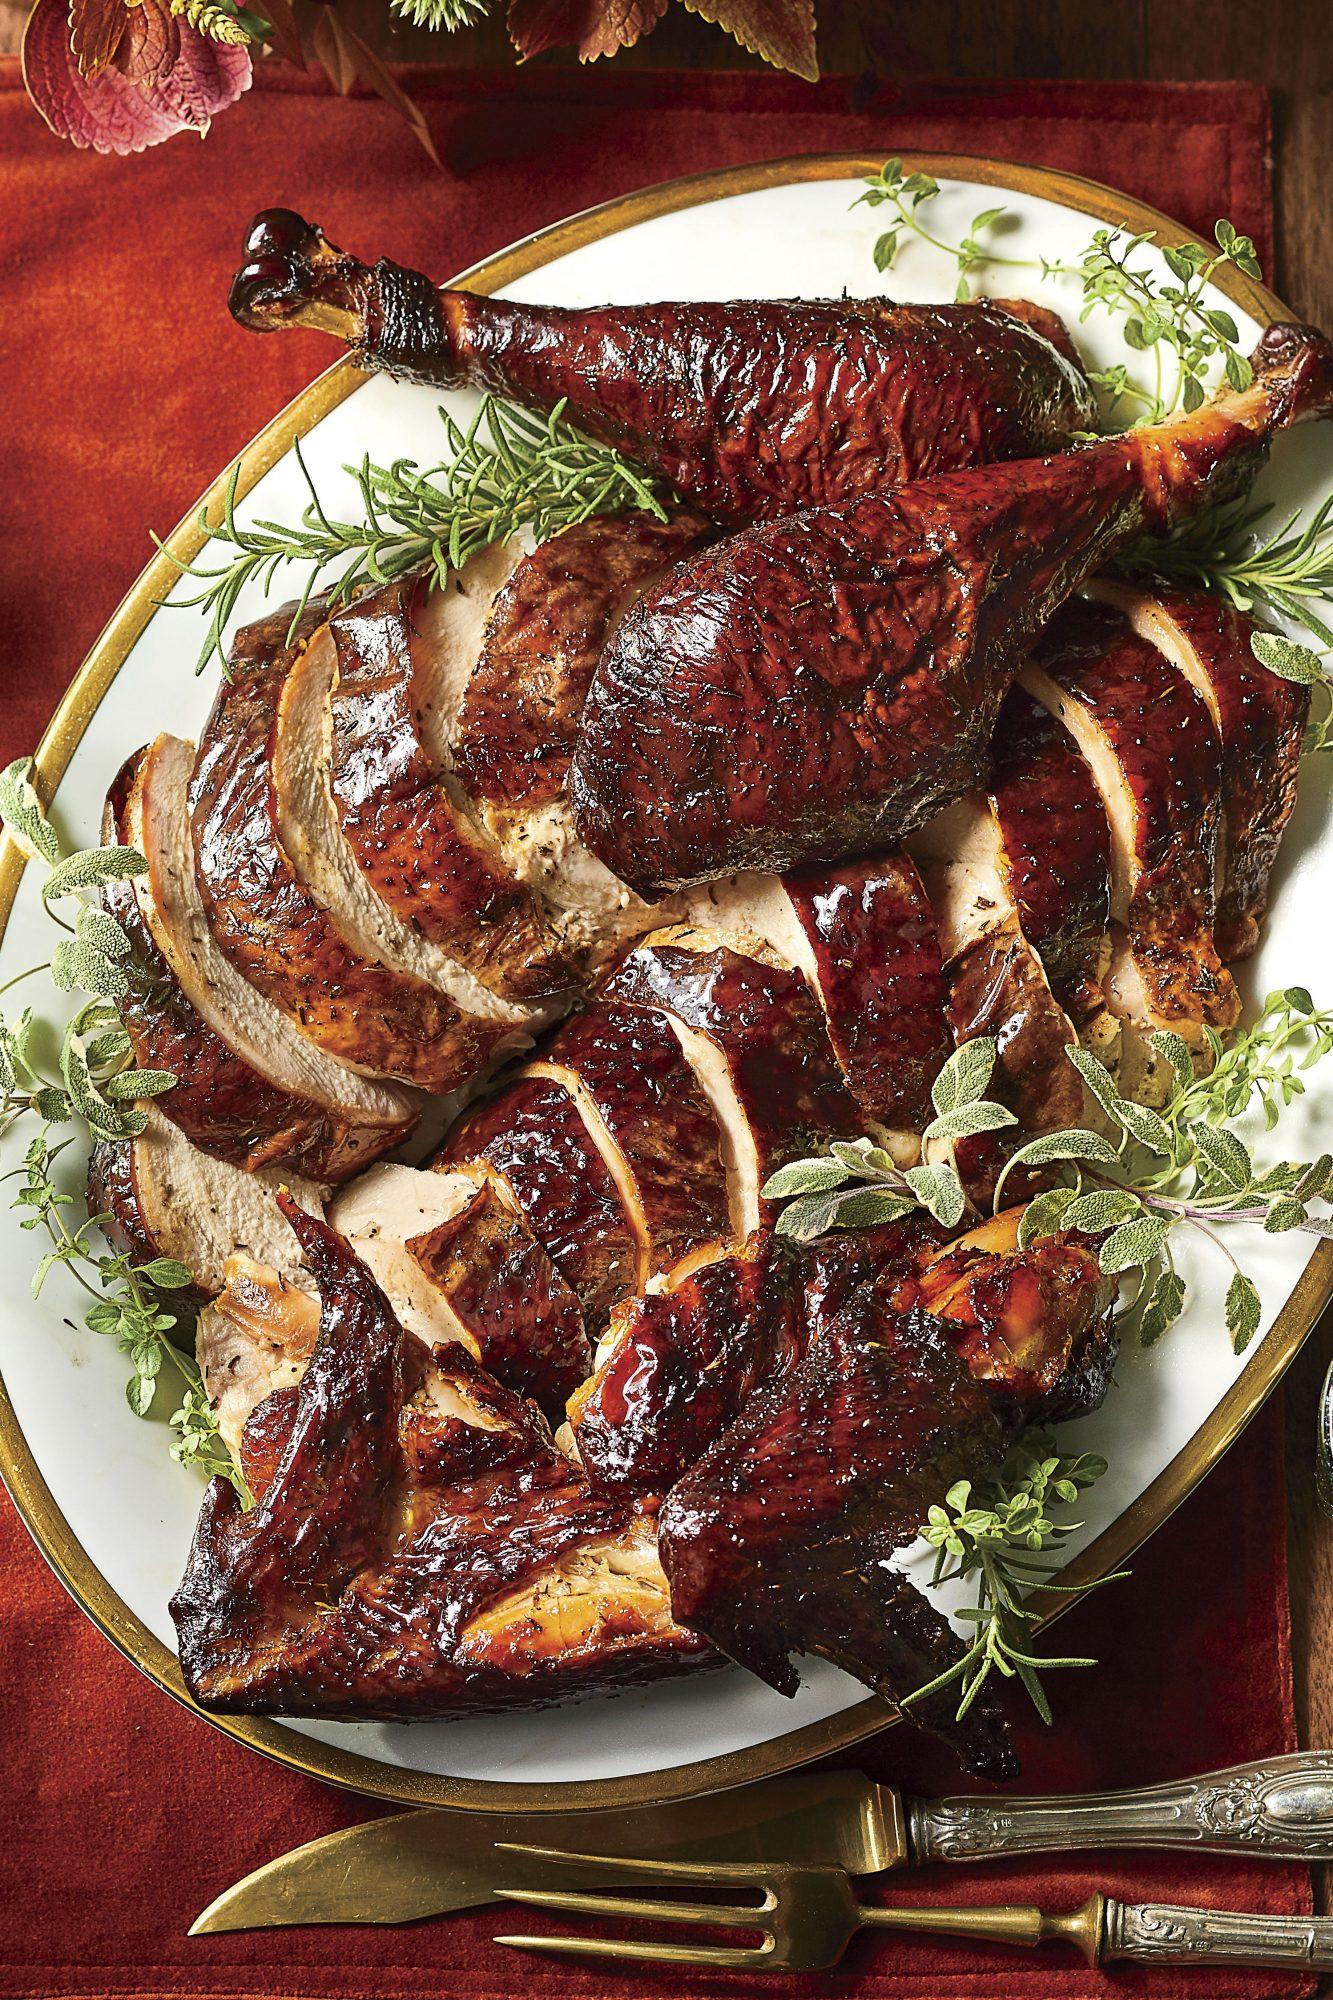 Smoked Turkey with Herb Rub